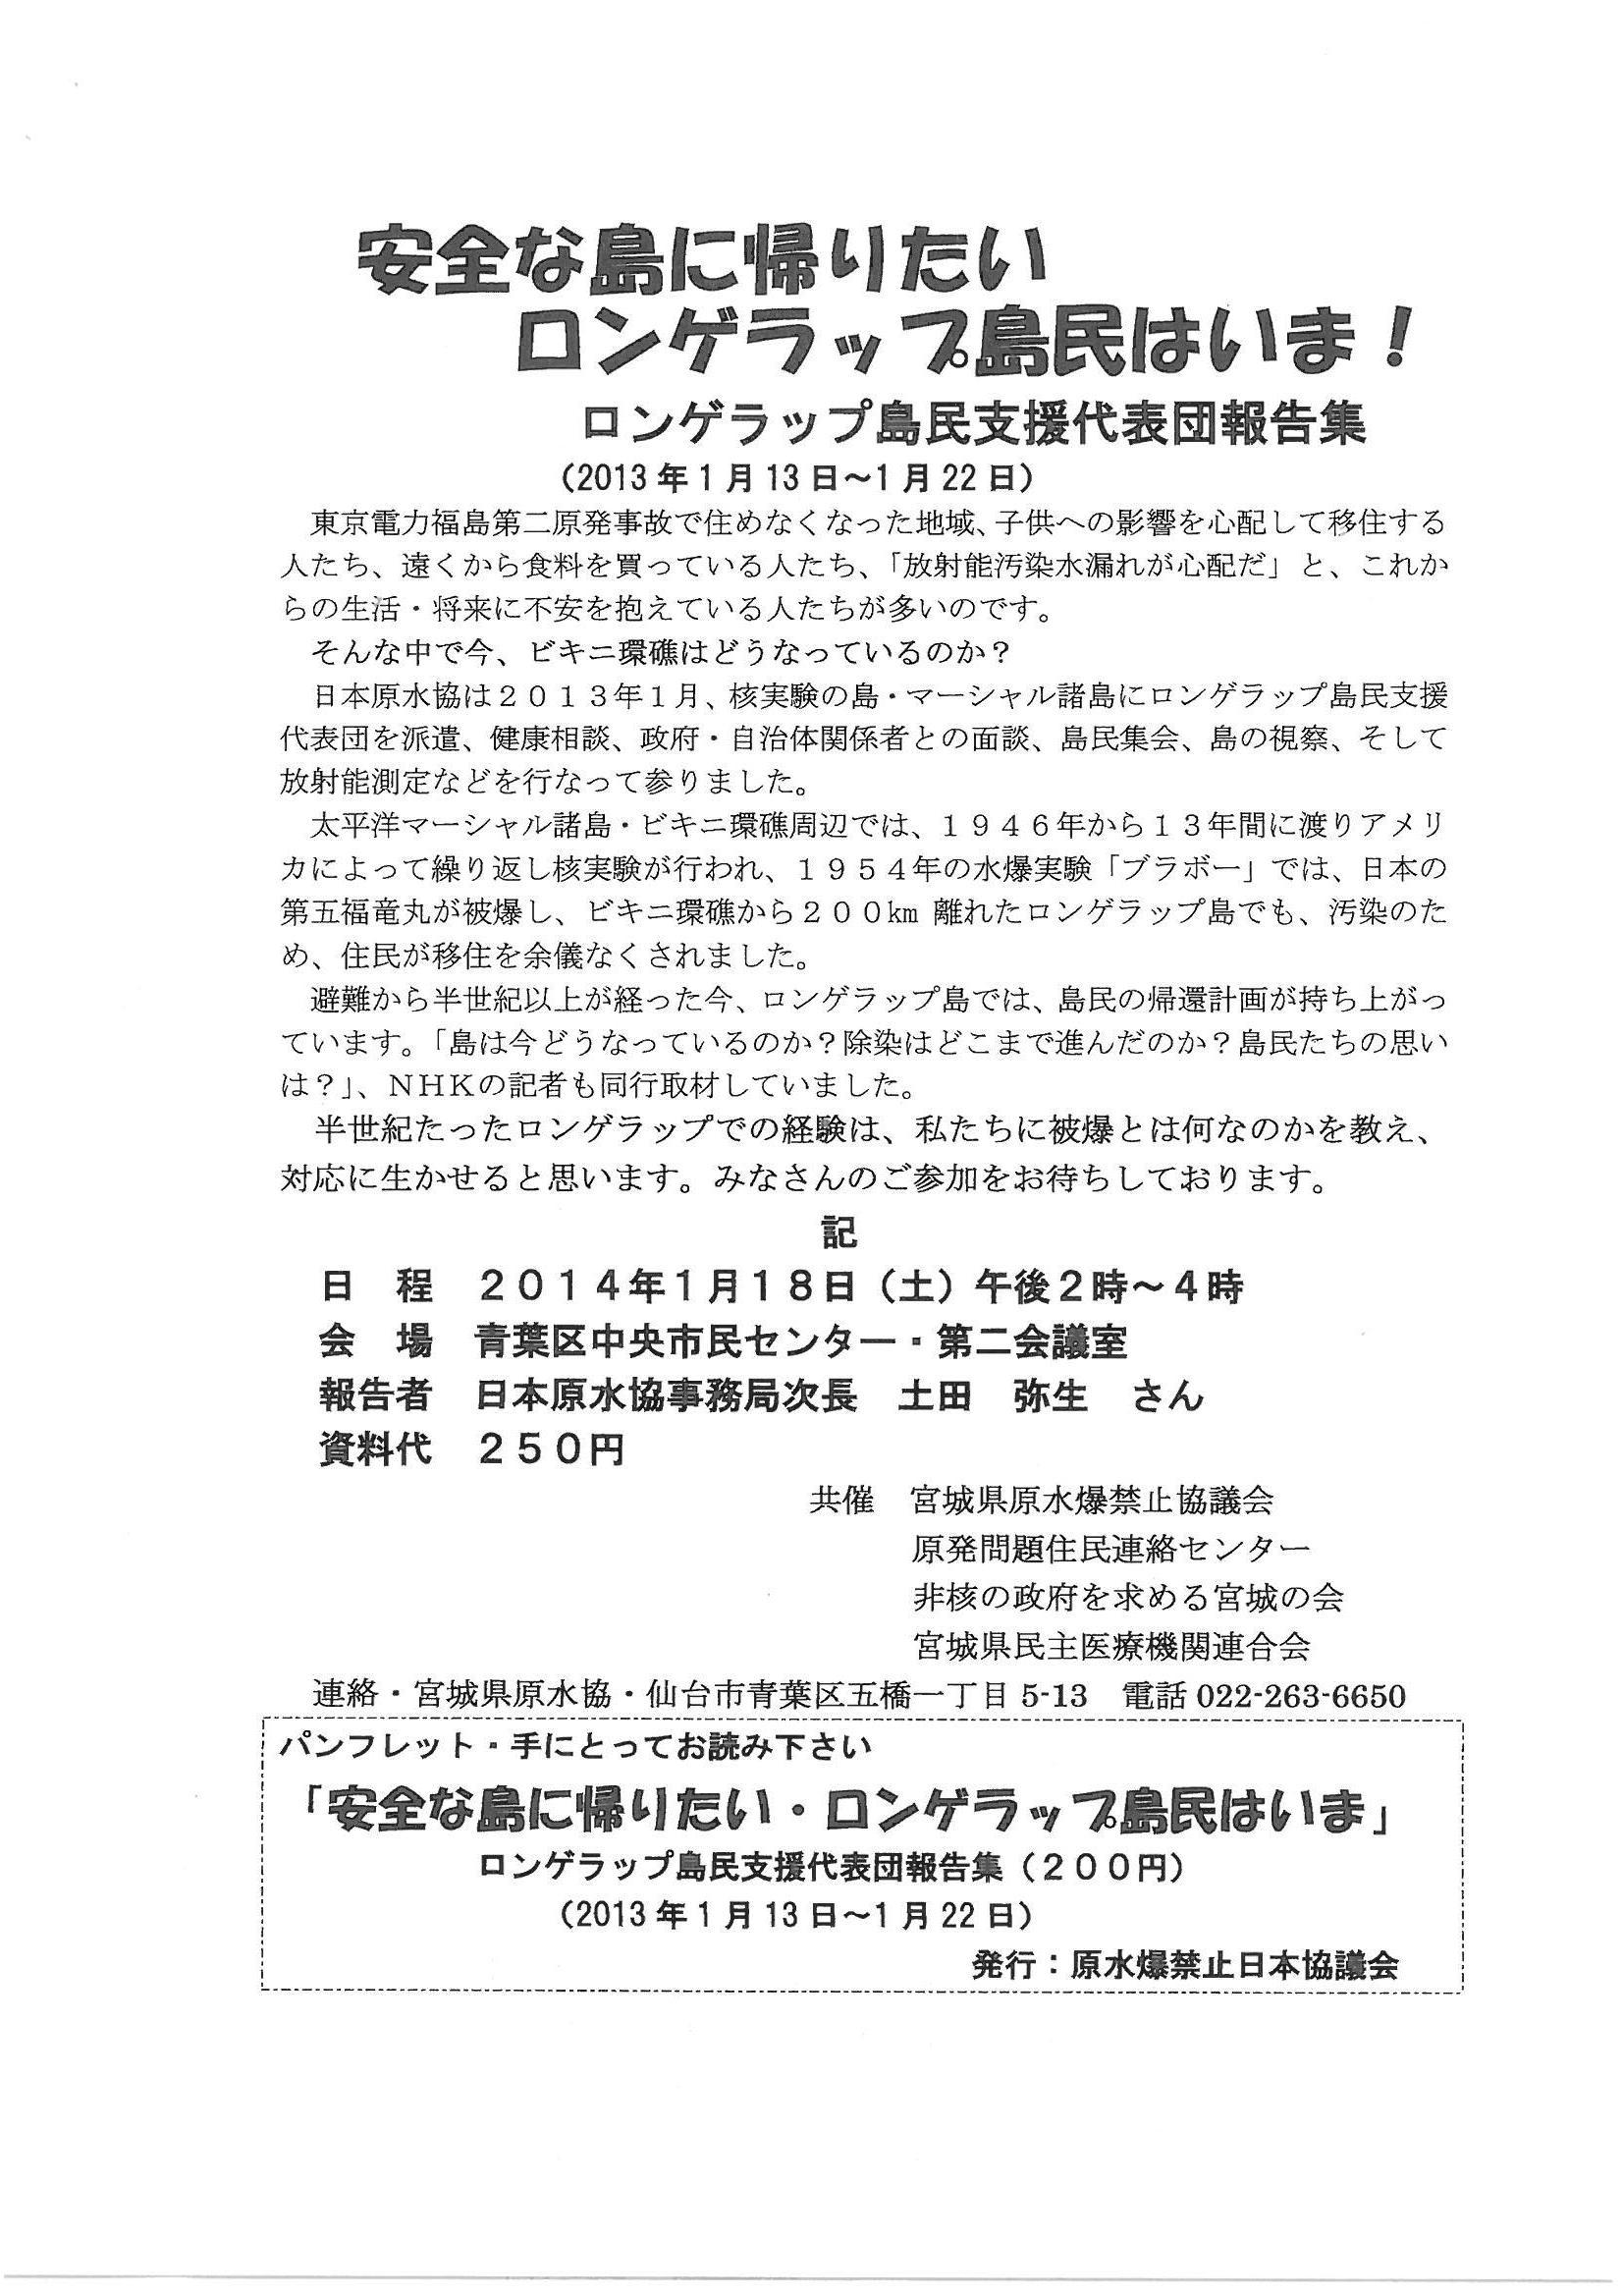 SKMBT_C22013122010150_0002.jpg